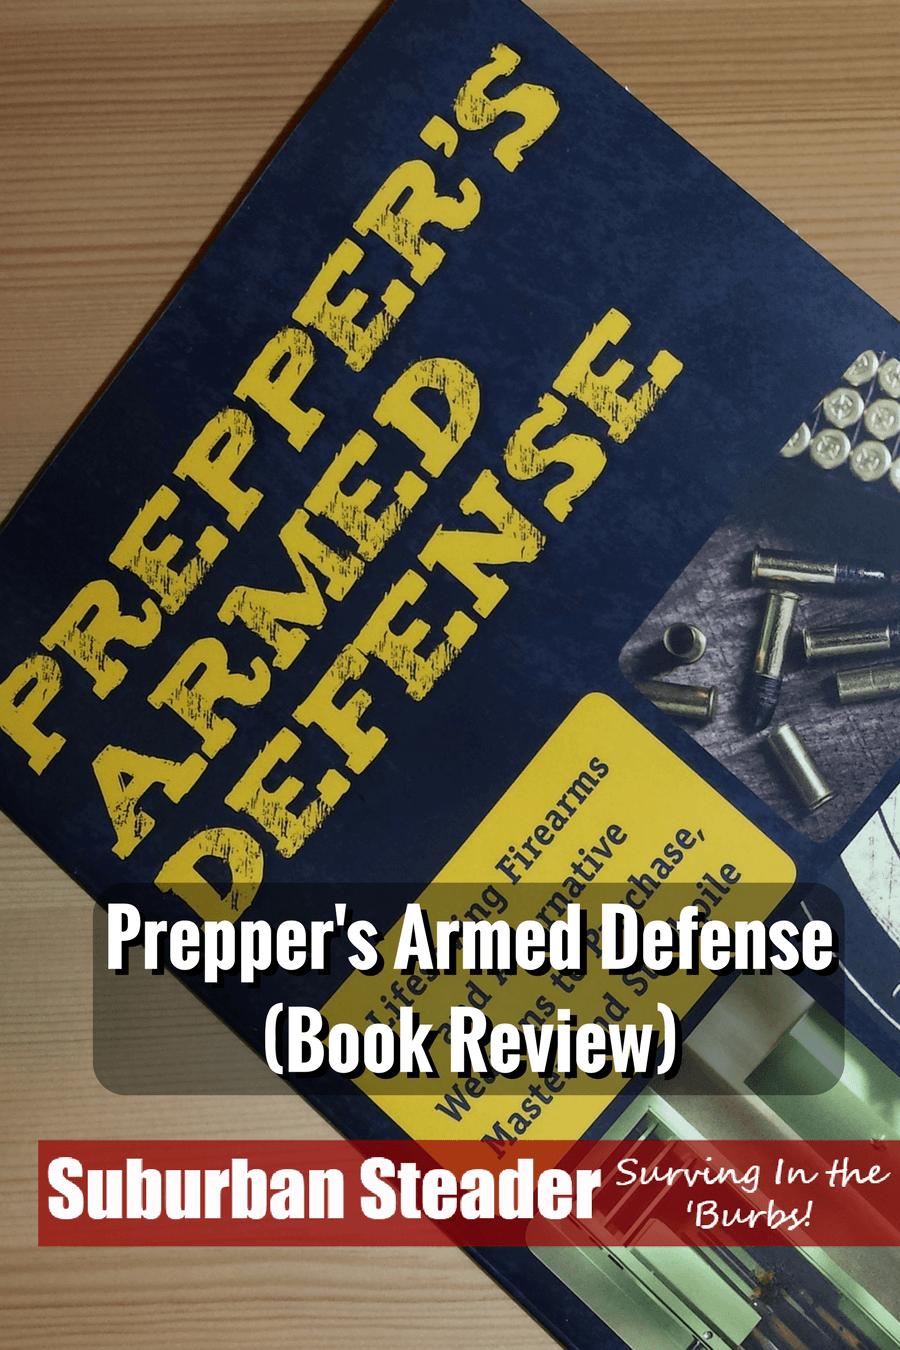 Prepper's Armed Defense (Book Review)